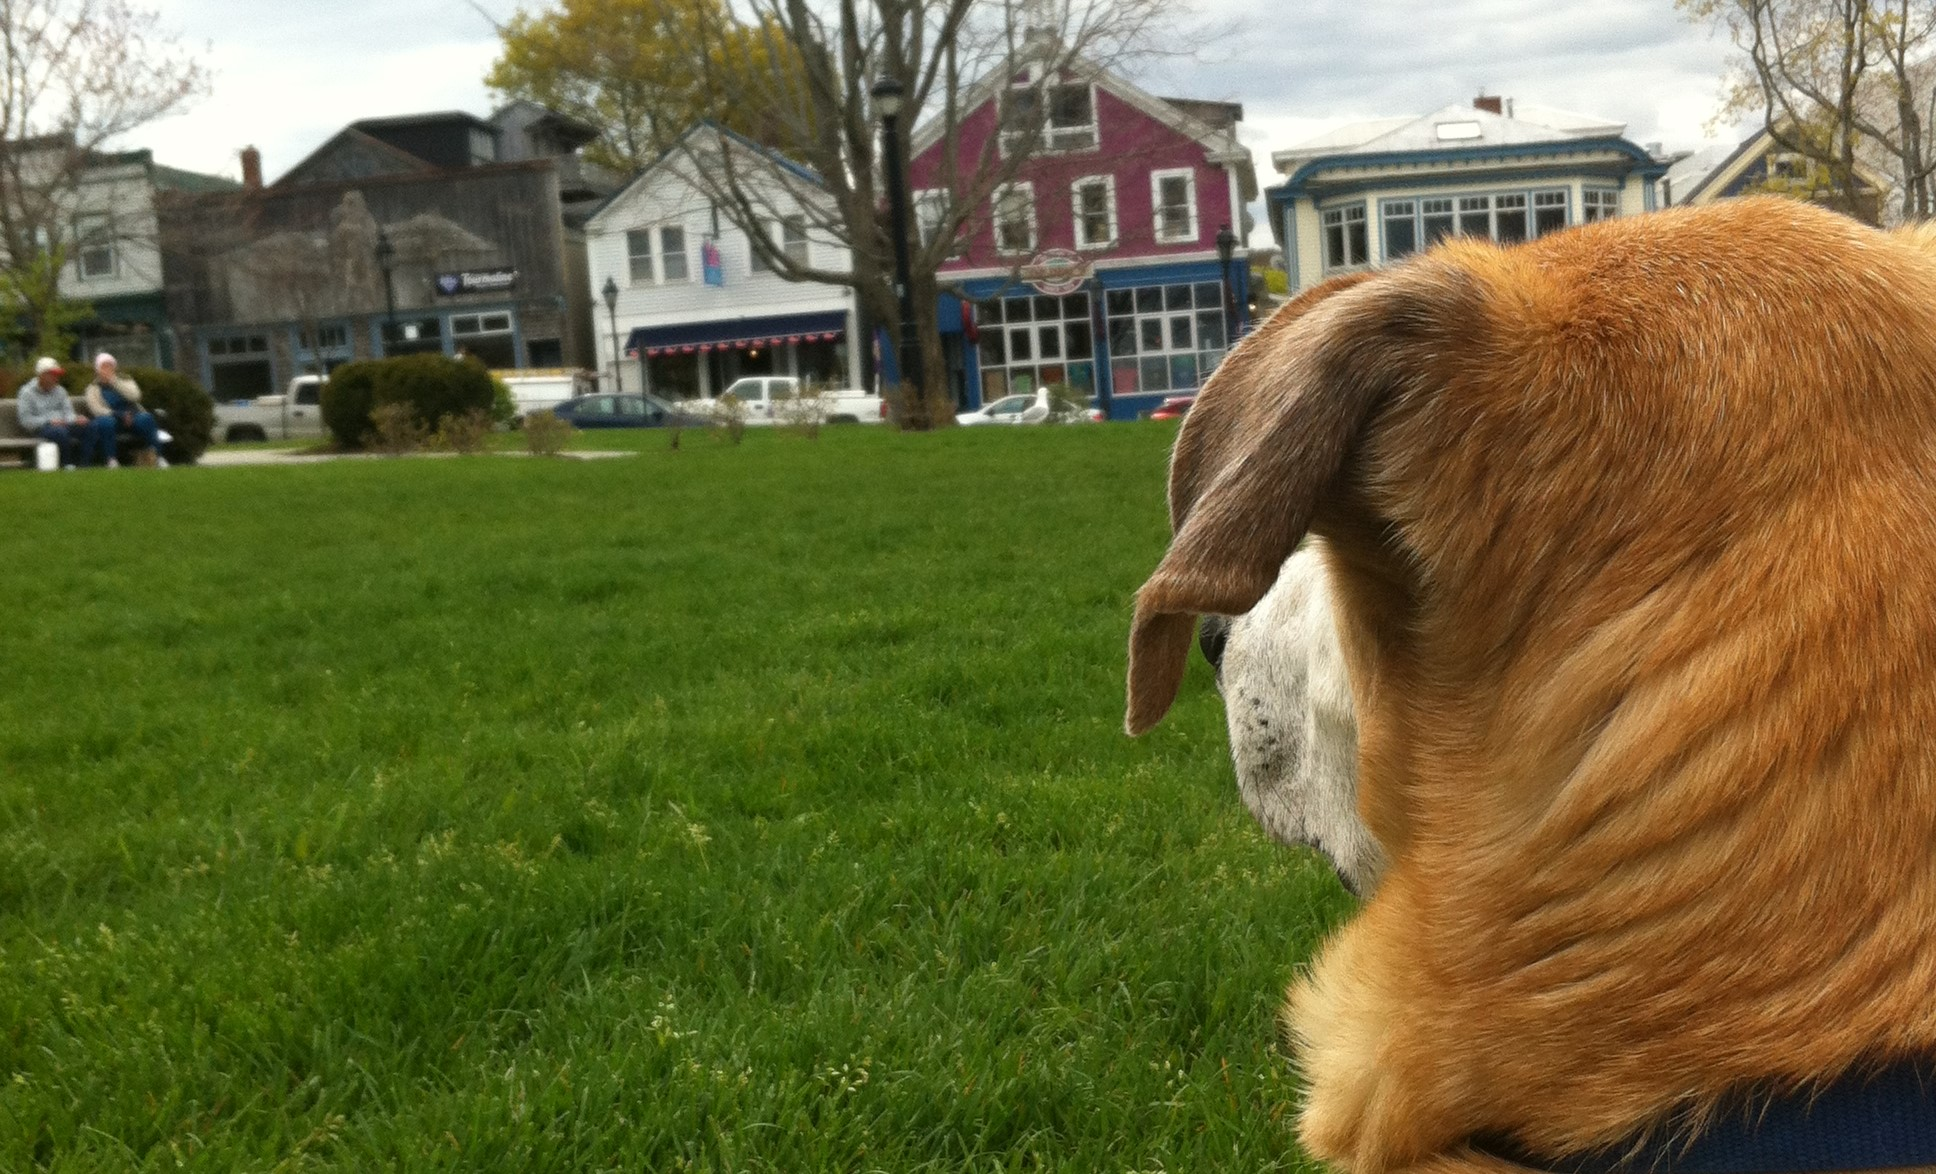 Bar Harbor Maine is a dog-friendly destination